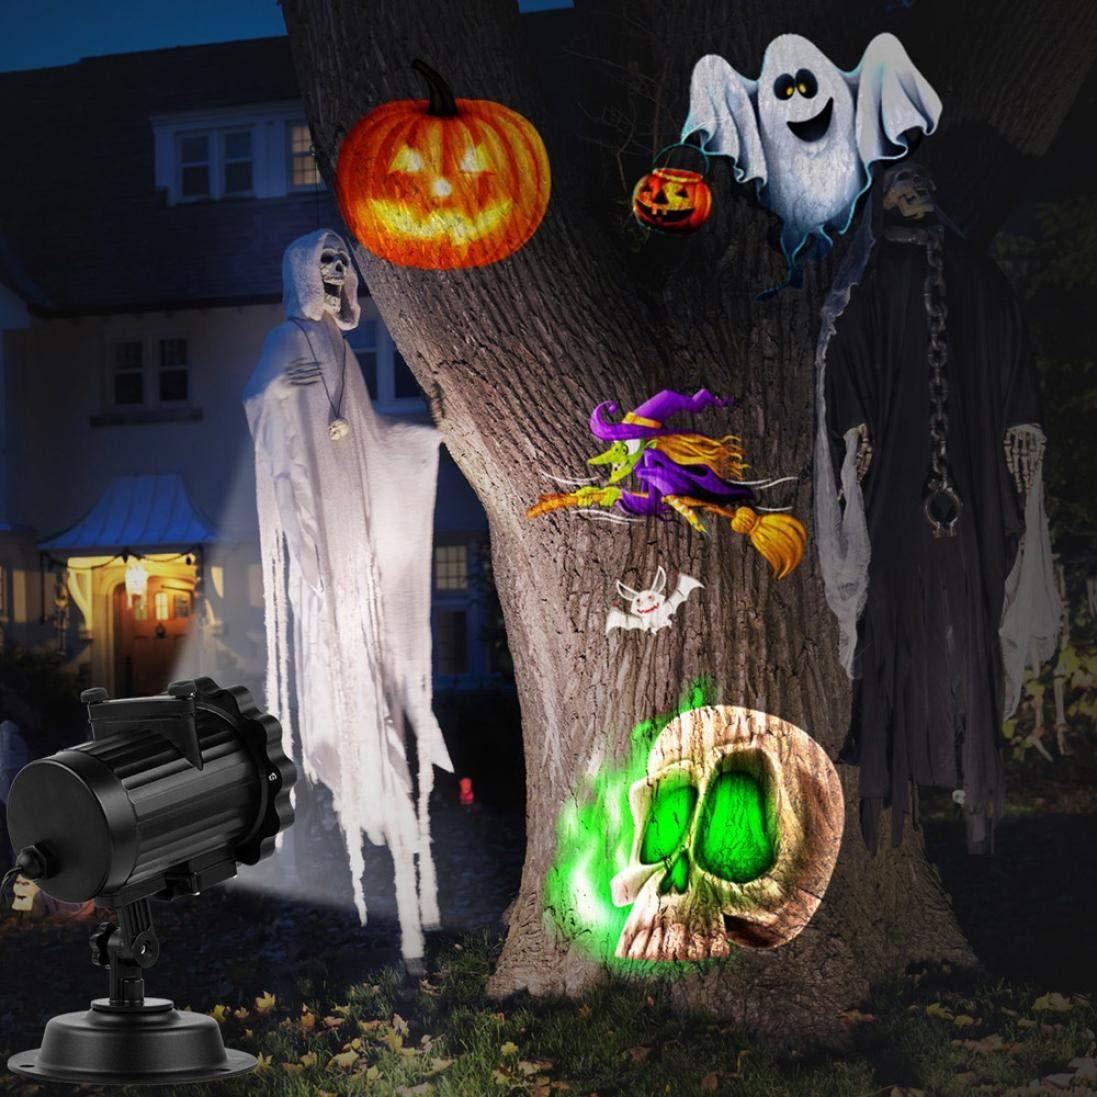 DDLBiz LED Projector Light 16 Pattern Landscape Lamp Projection For Halloween by DDLBiz (Image #2)